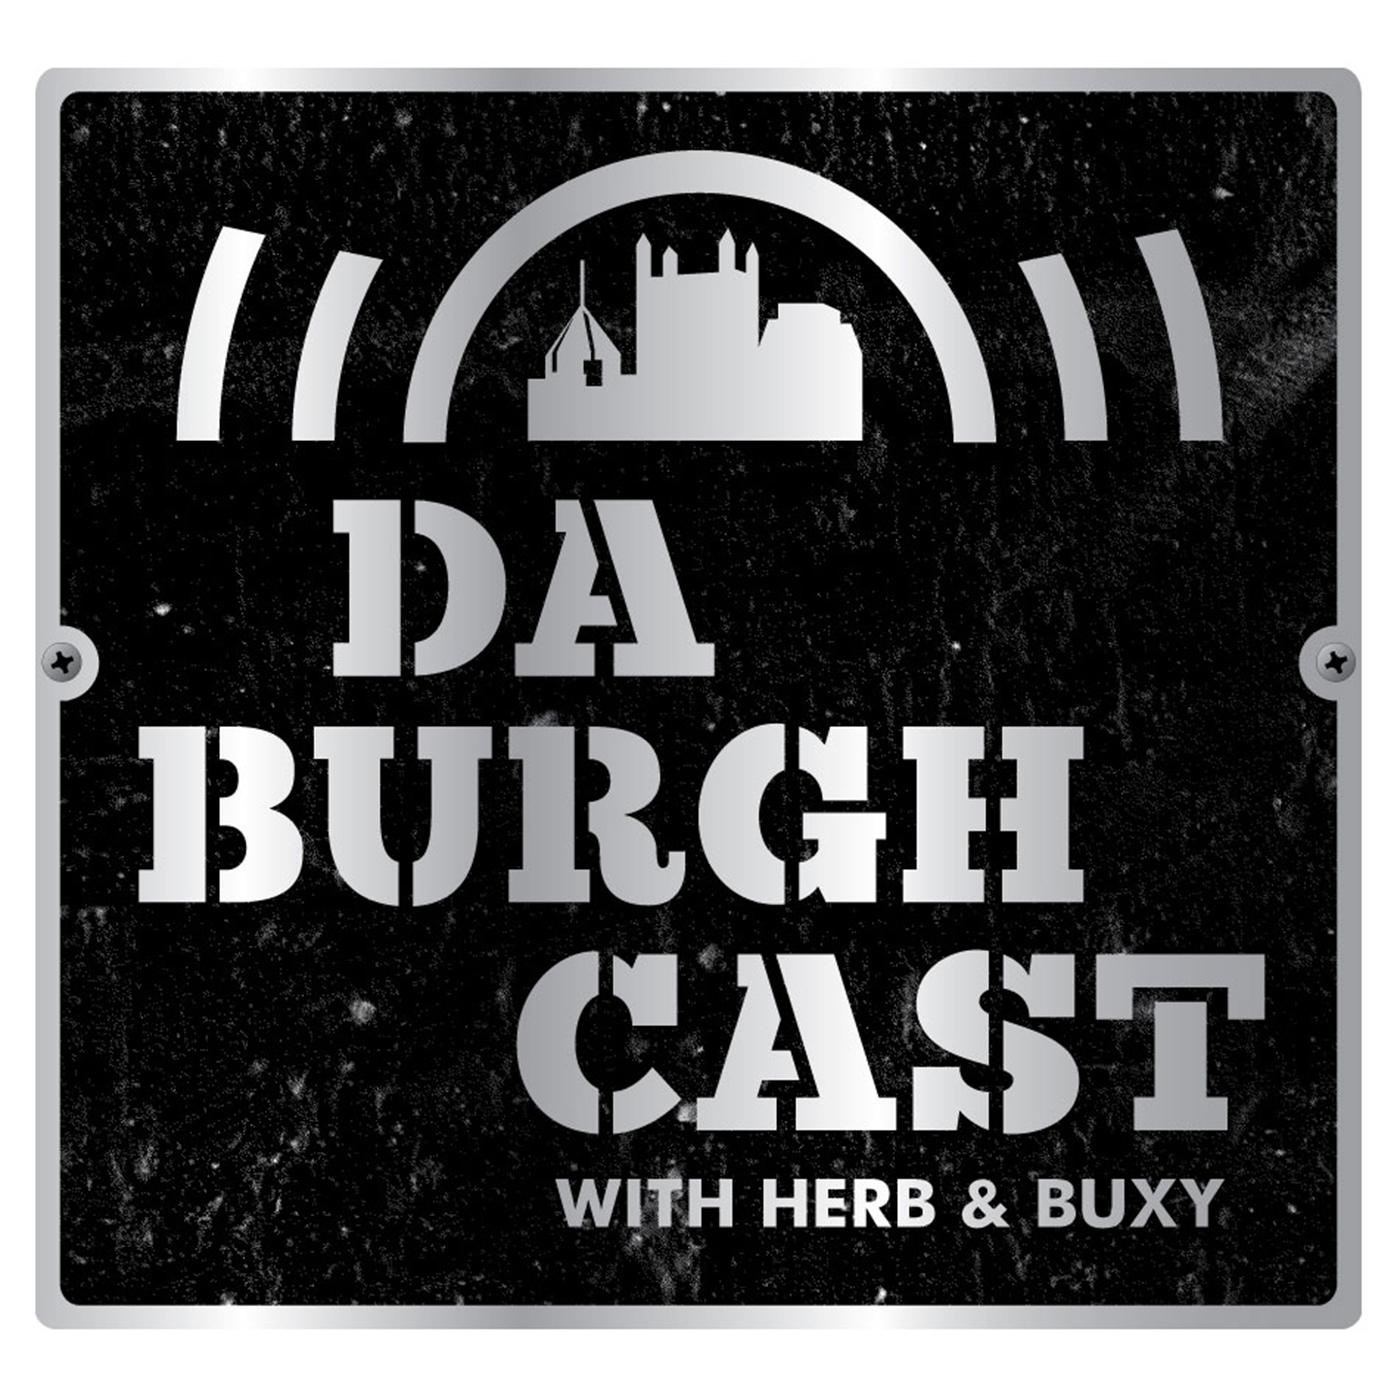 Da Burghcast!